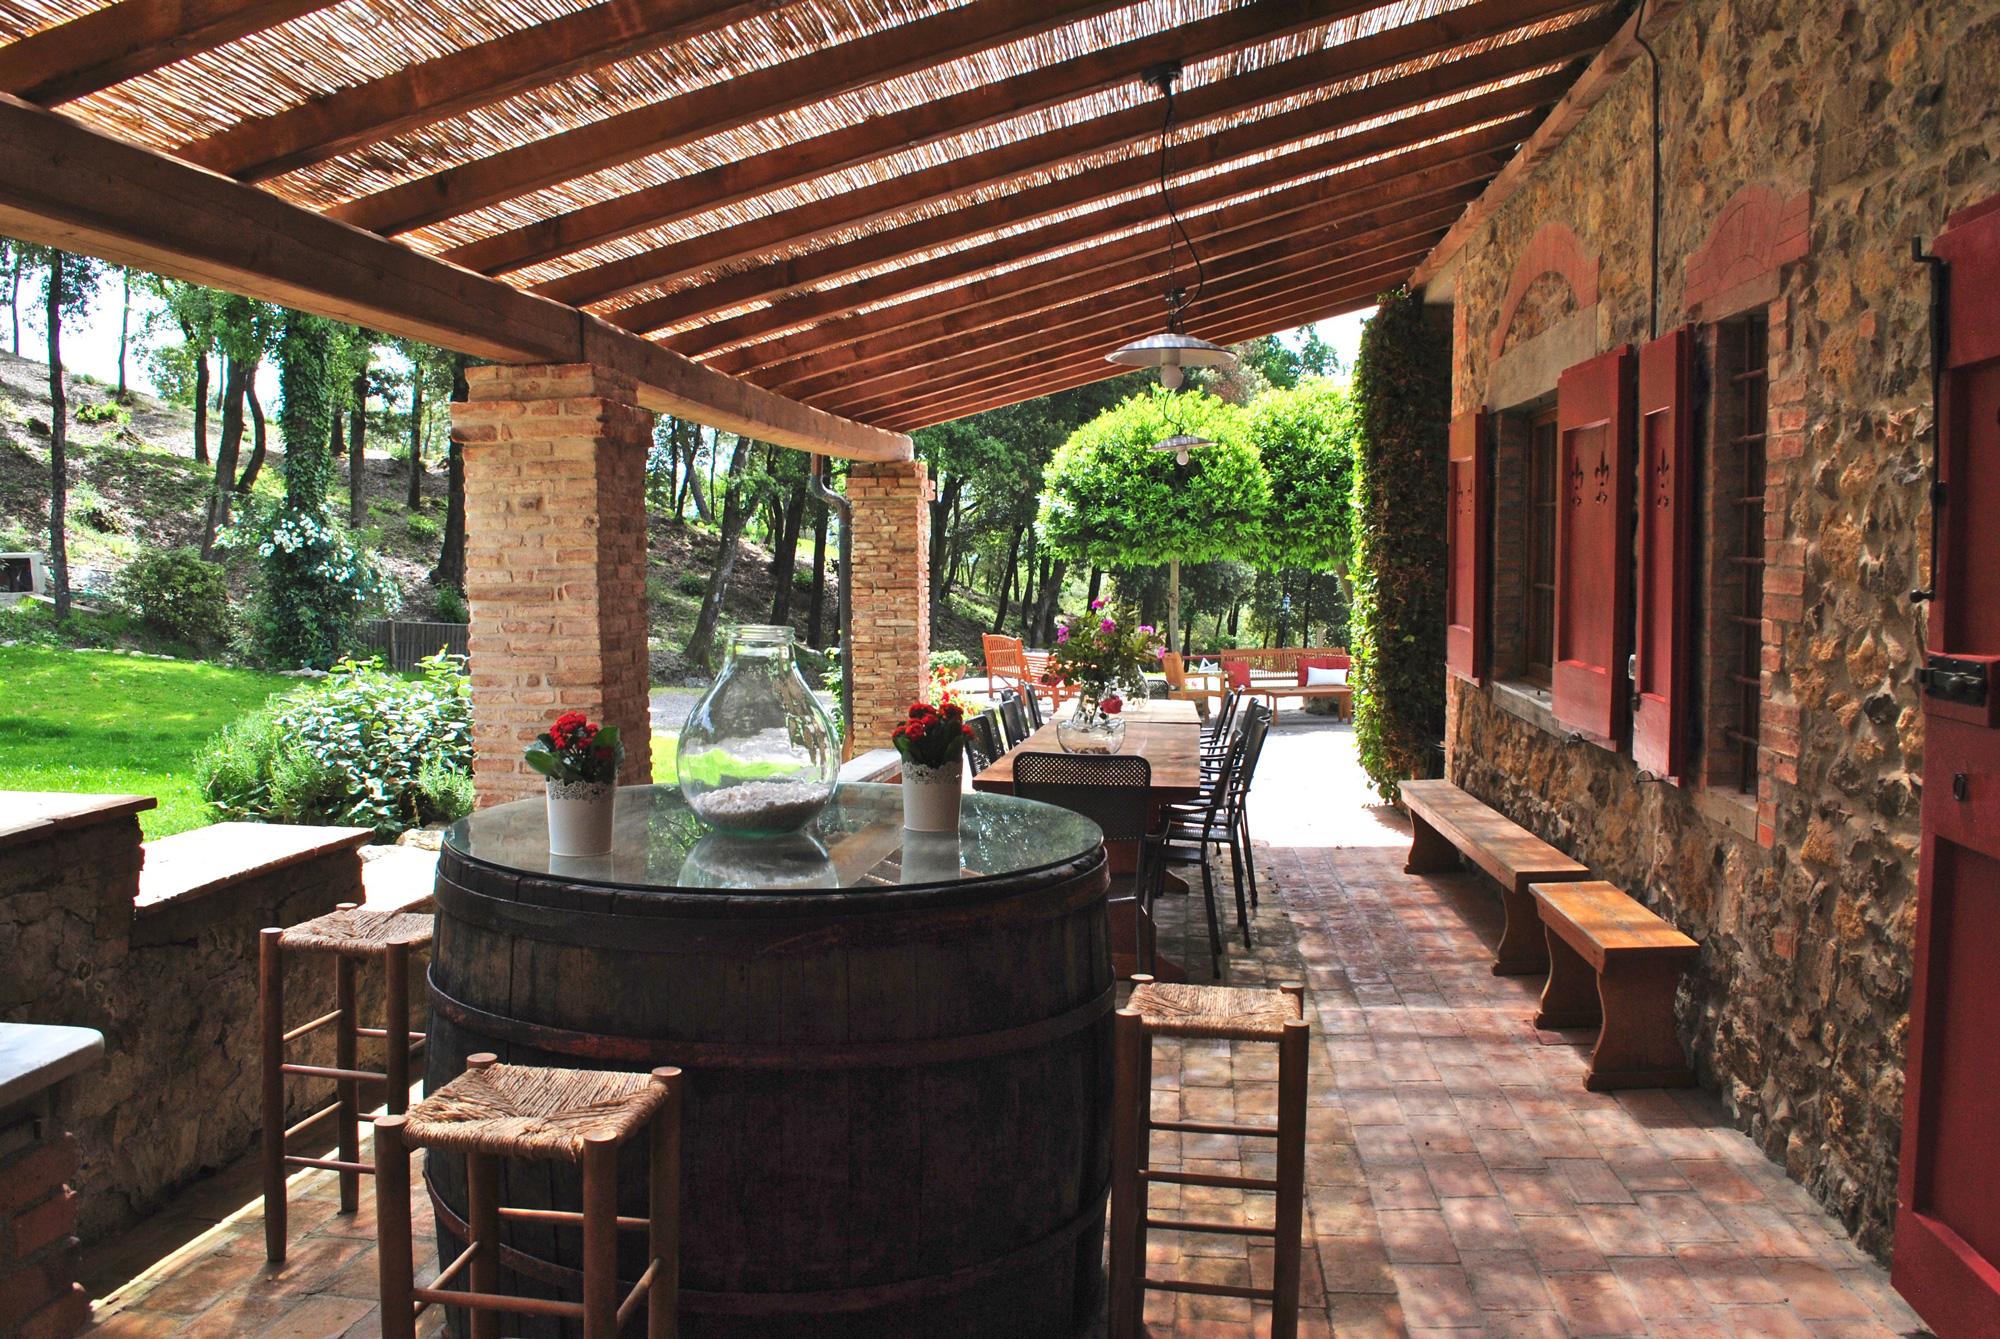 https://www.villalasciolta.it/wp-content/uploads/2016/02/villa-la-sciolta-tuscany6.jpg